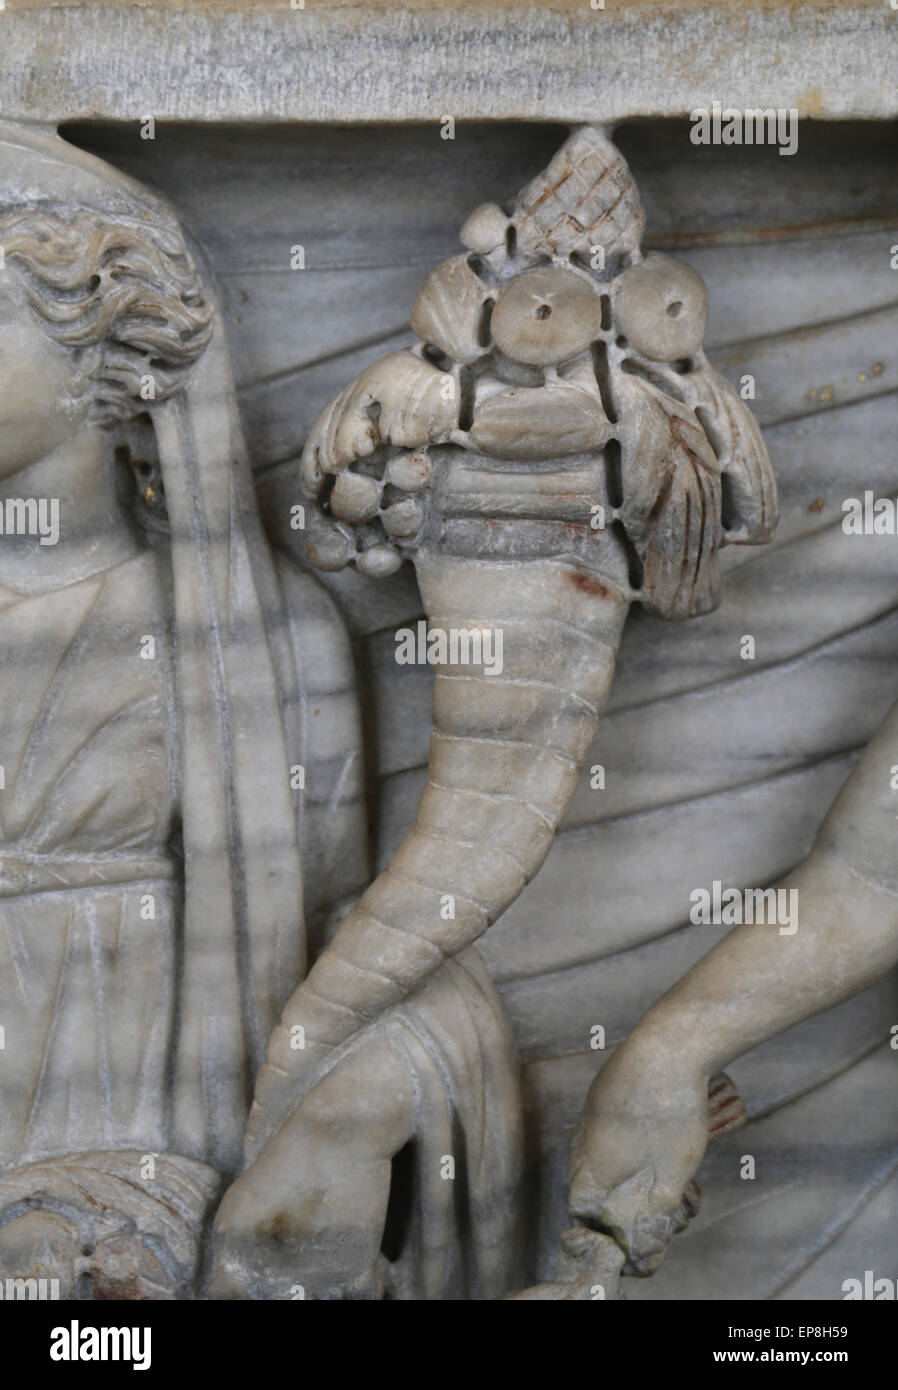 Roman sarcophagus. Marriage ceremony. Abundantia. Detail cornucopia or horn of plenty. From Via Latina, 270-80 CE. - Stock Image